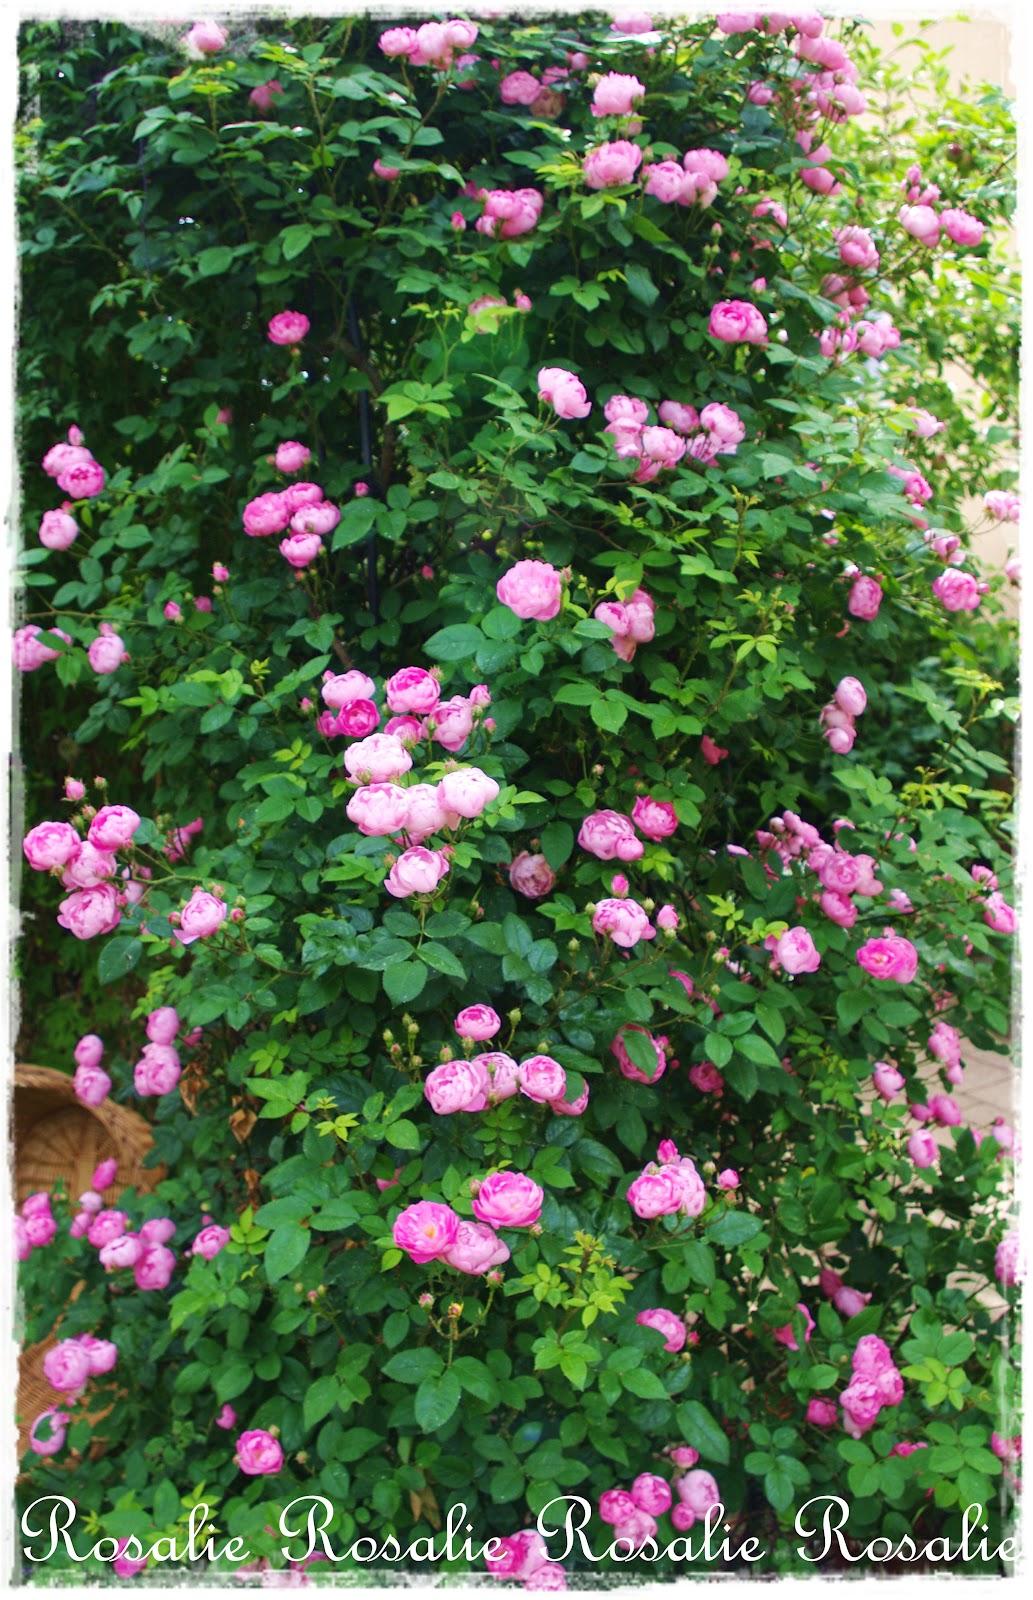 rosalies tr ume raubritter im rosaliegarten. Black Bedroom Furniture Sets. Home Design Ideas